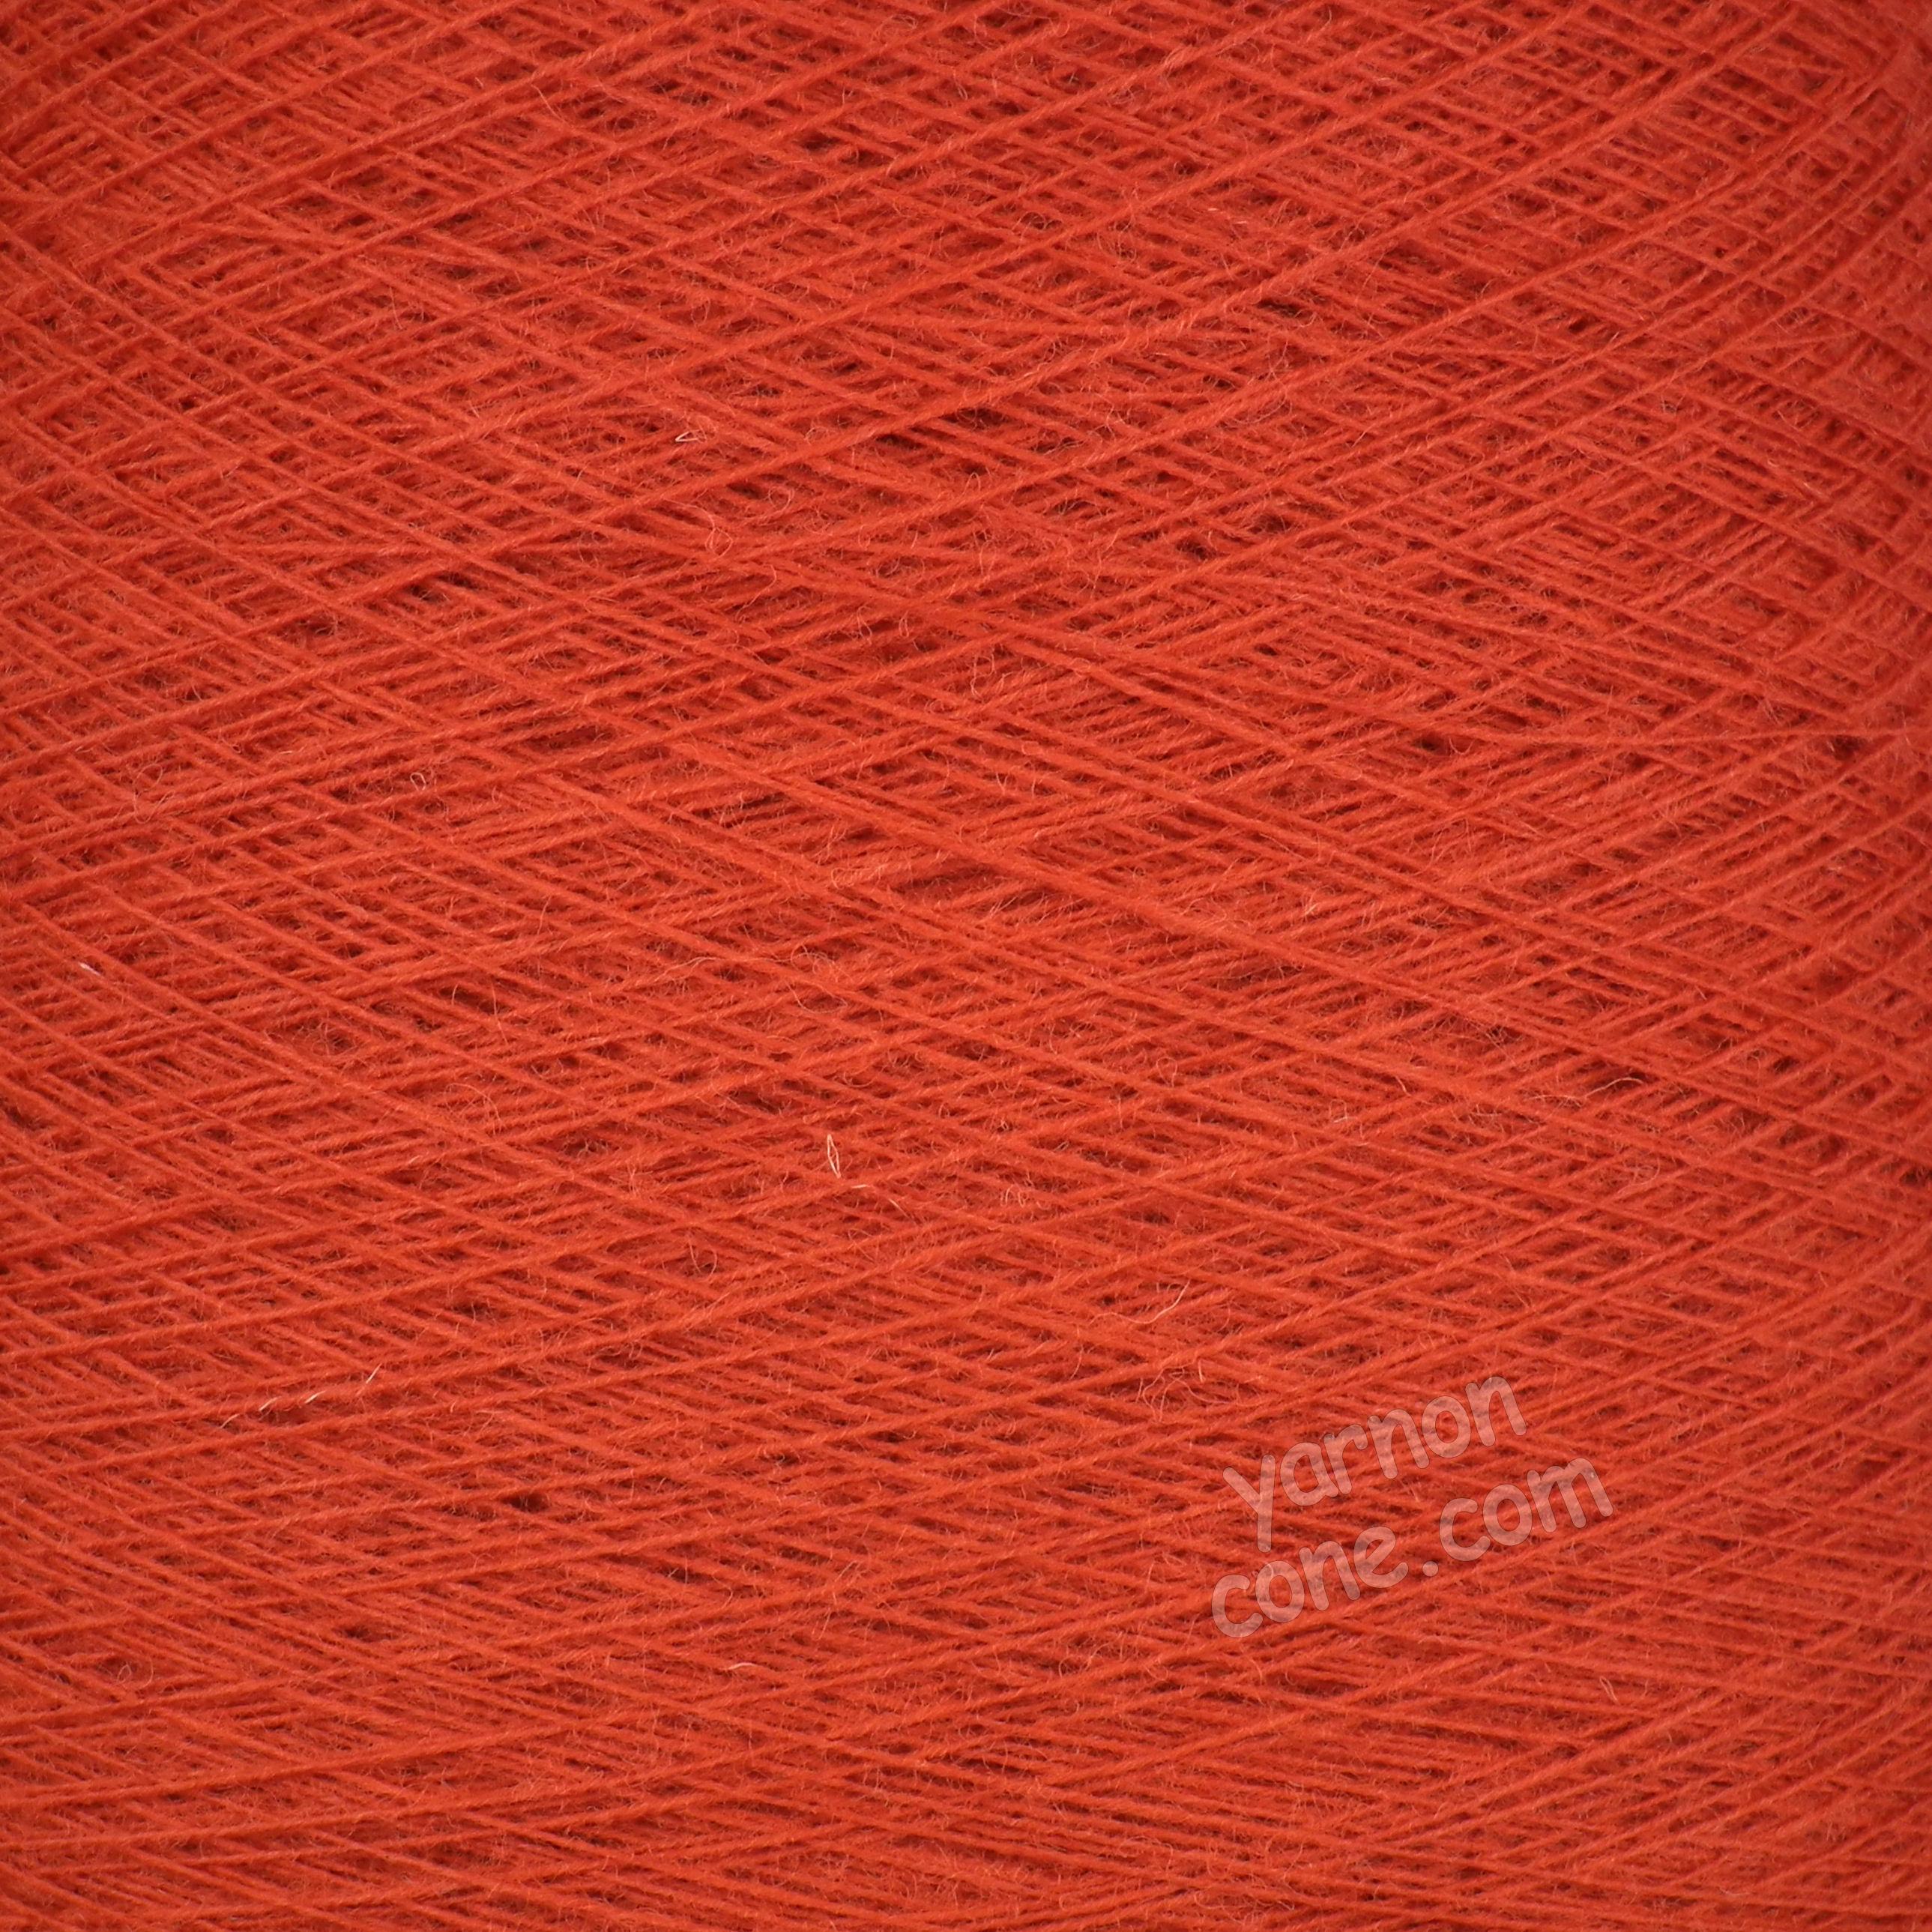 single 8s 1/8 NM pure weaving wool yarn on cone UK weavers yarn